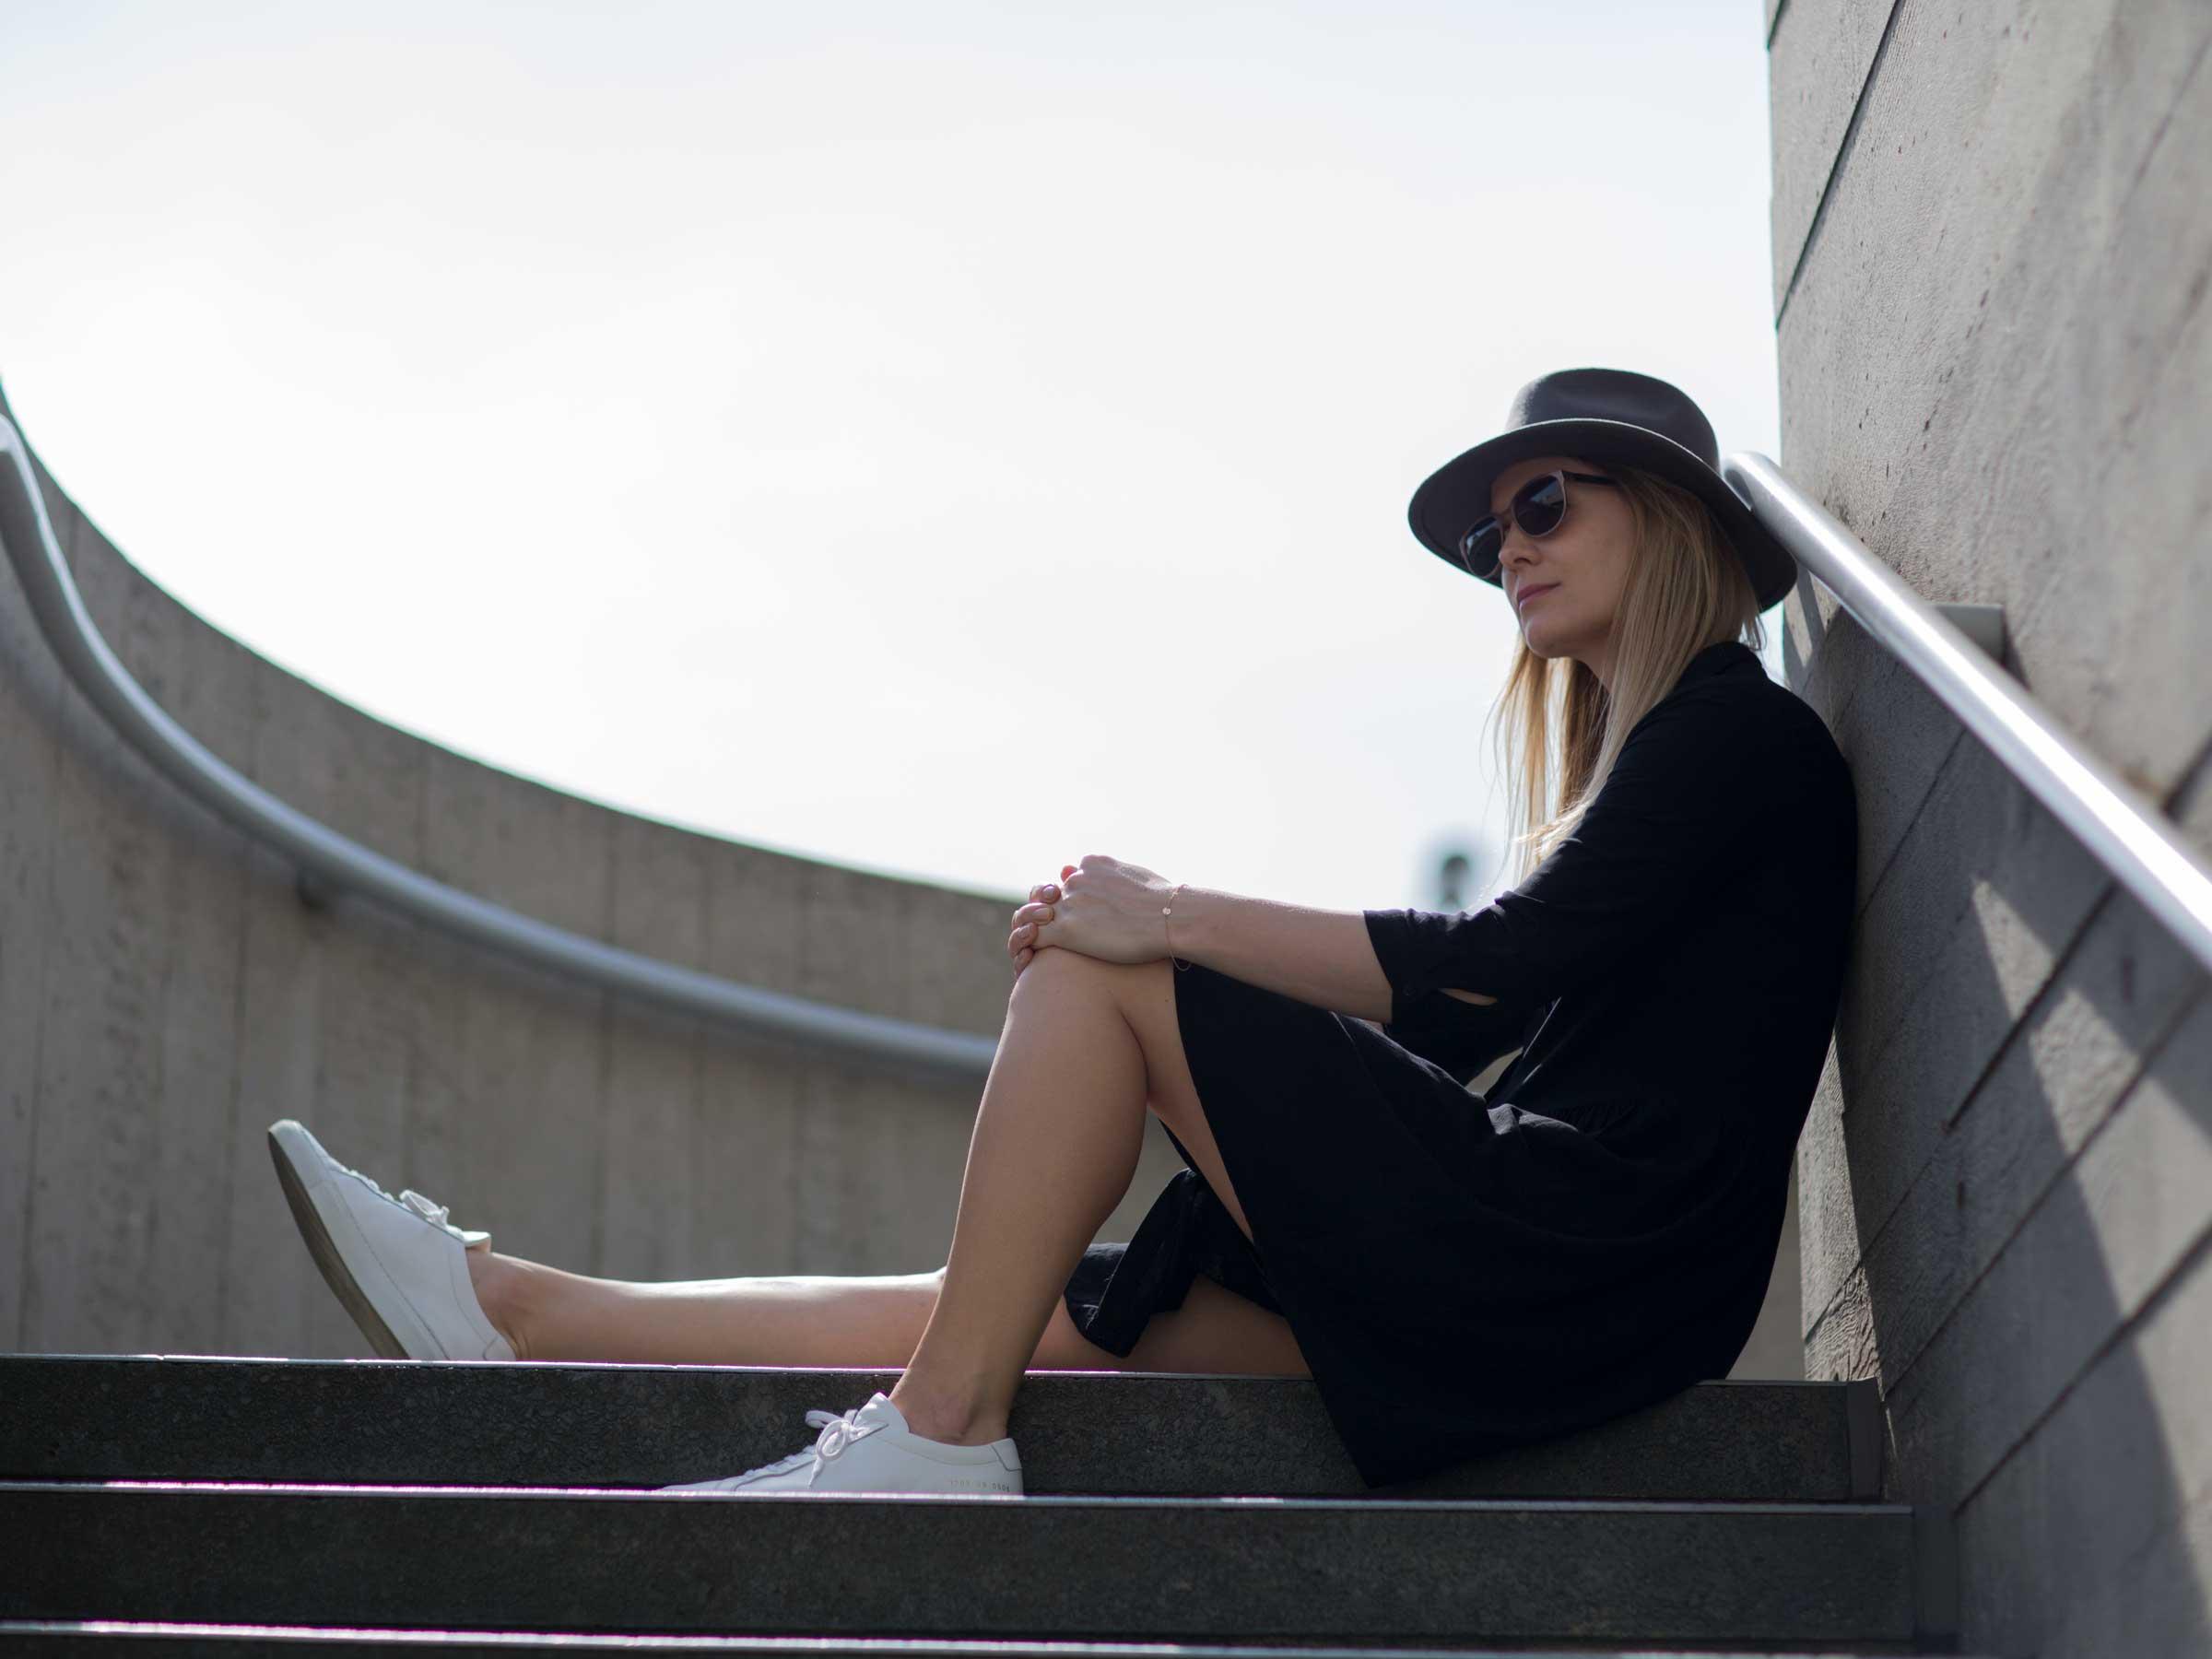 Style&Minimalism | It's Personal | Hush Black Dress, Common Projects, Straw Basket Bag